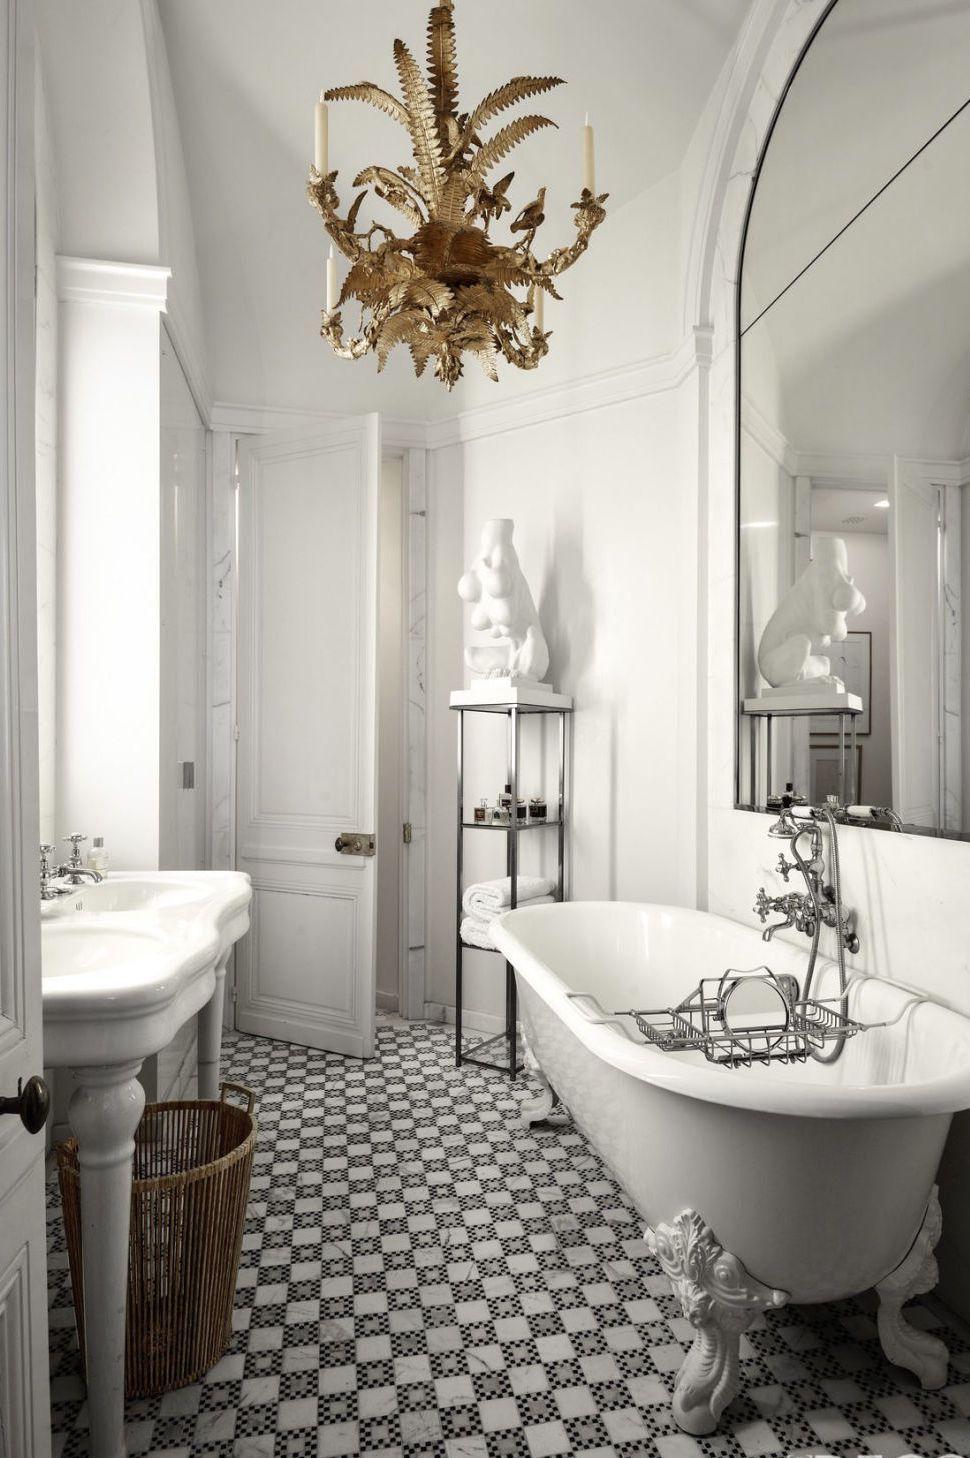 Modern interior design bathroom Apartment Modern Bathroom Ideas Elle Decor 25 Best Modern Bathrooms Luxe Bathroom Ideas With Modern Design